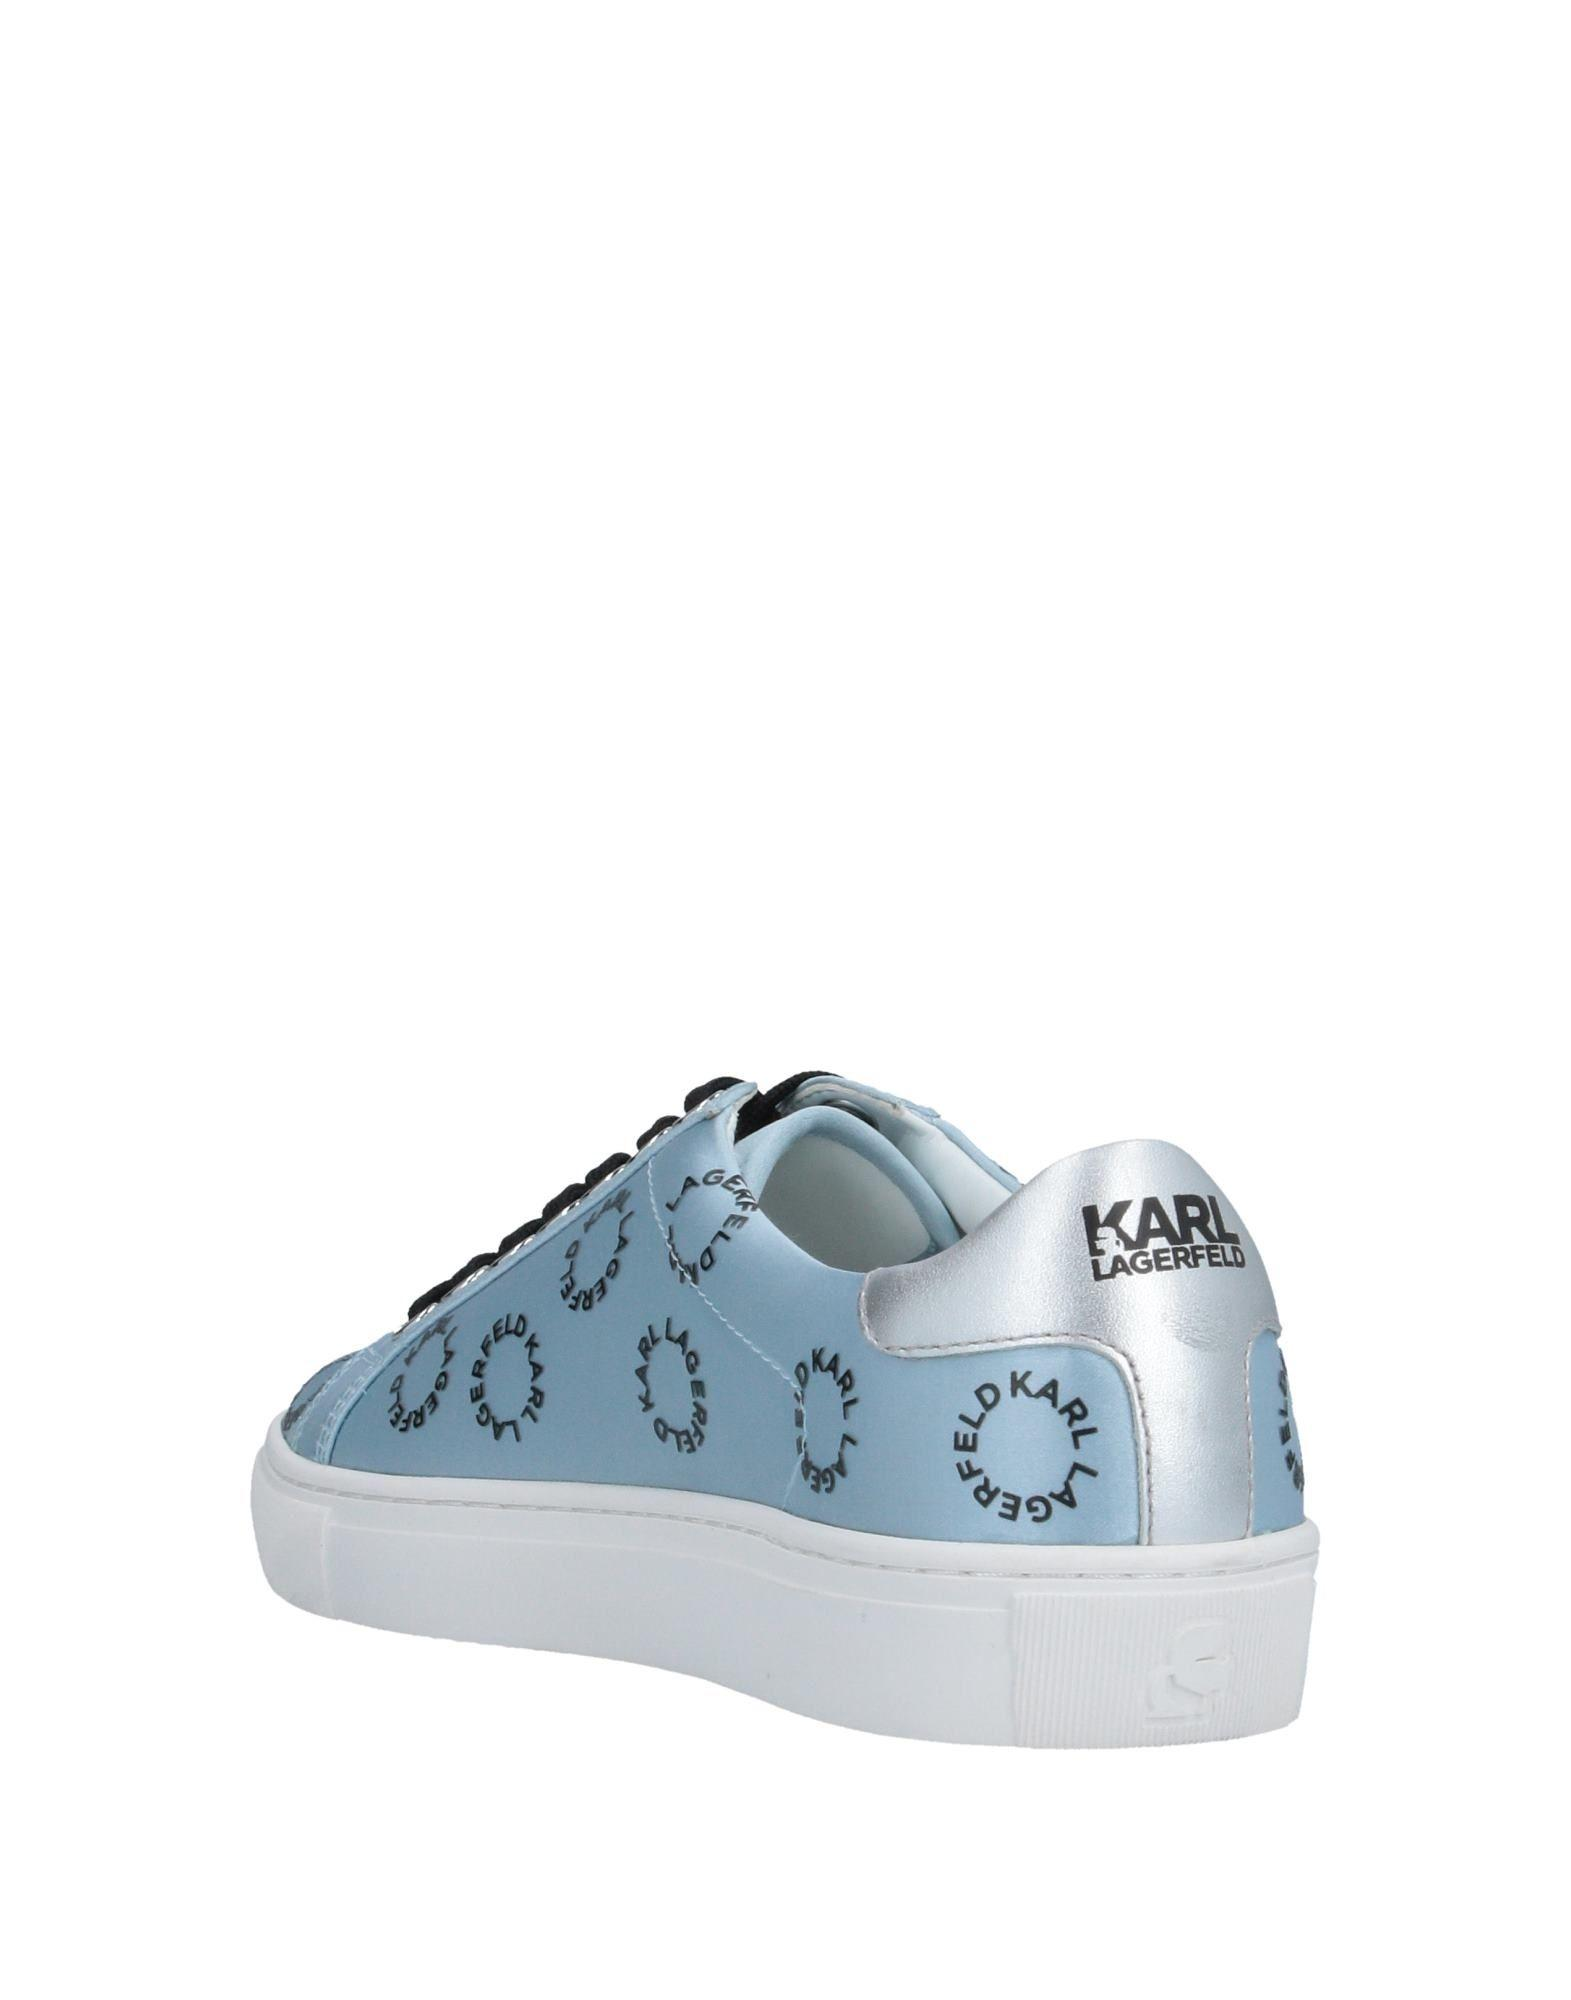 Sneakers & Deportivas Karl Lagerfeld de Raso de color Azul